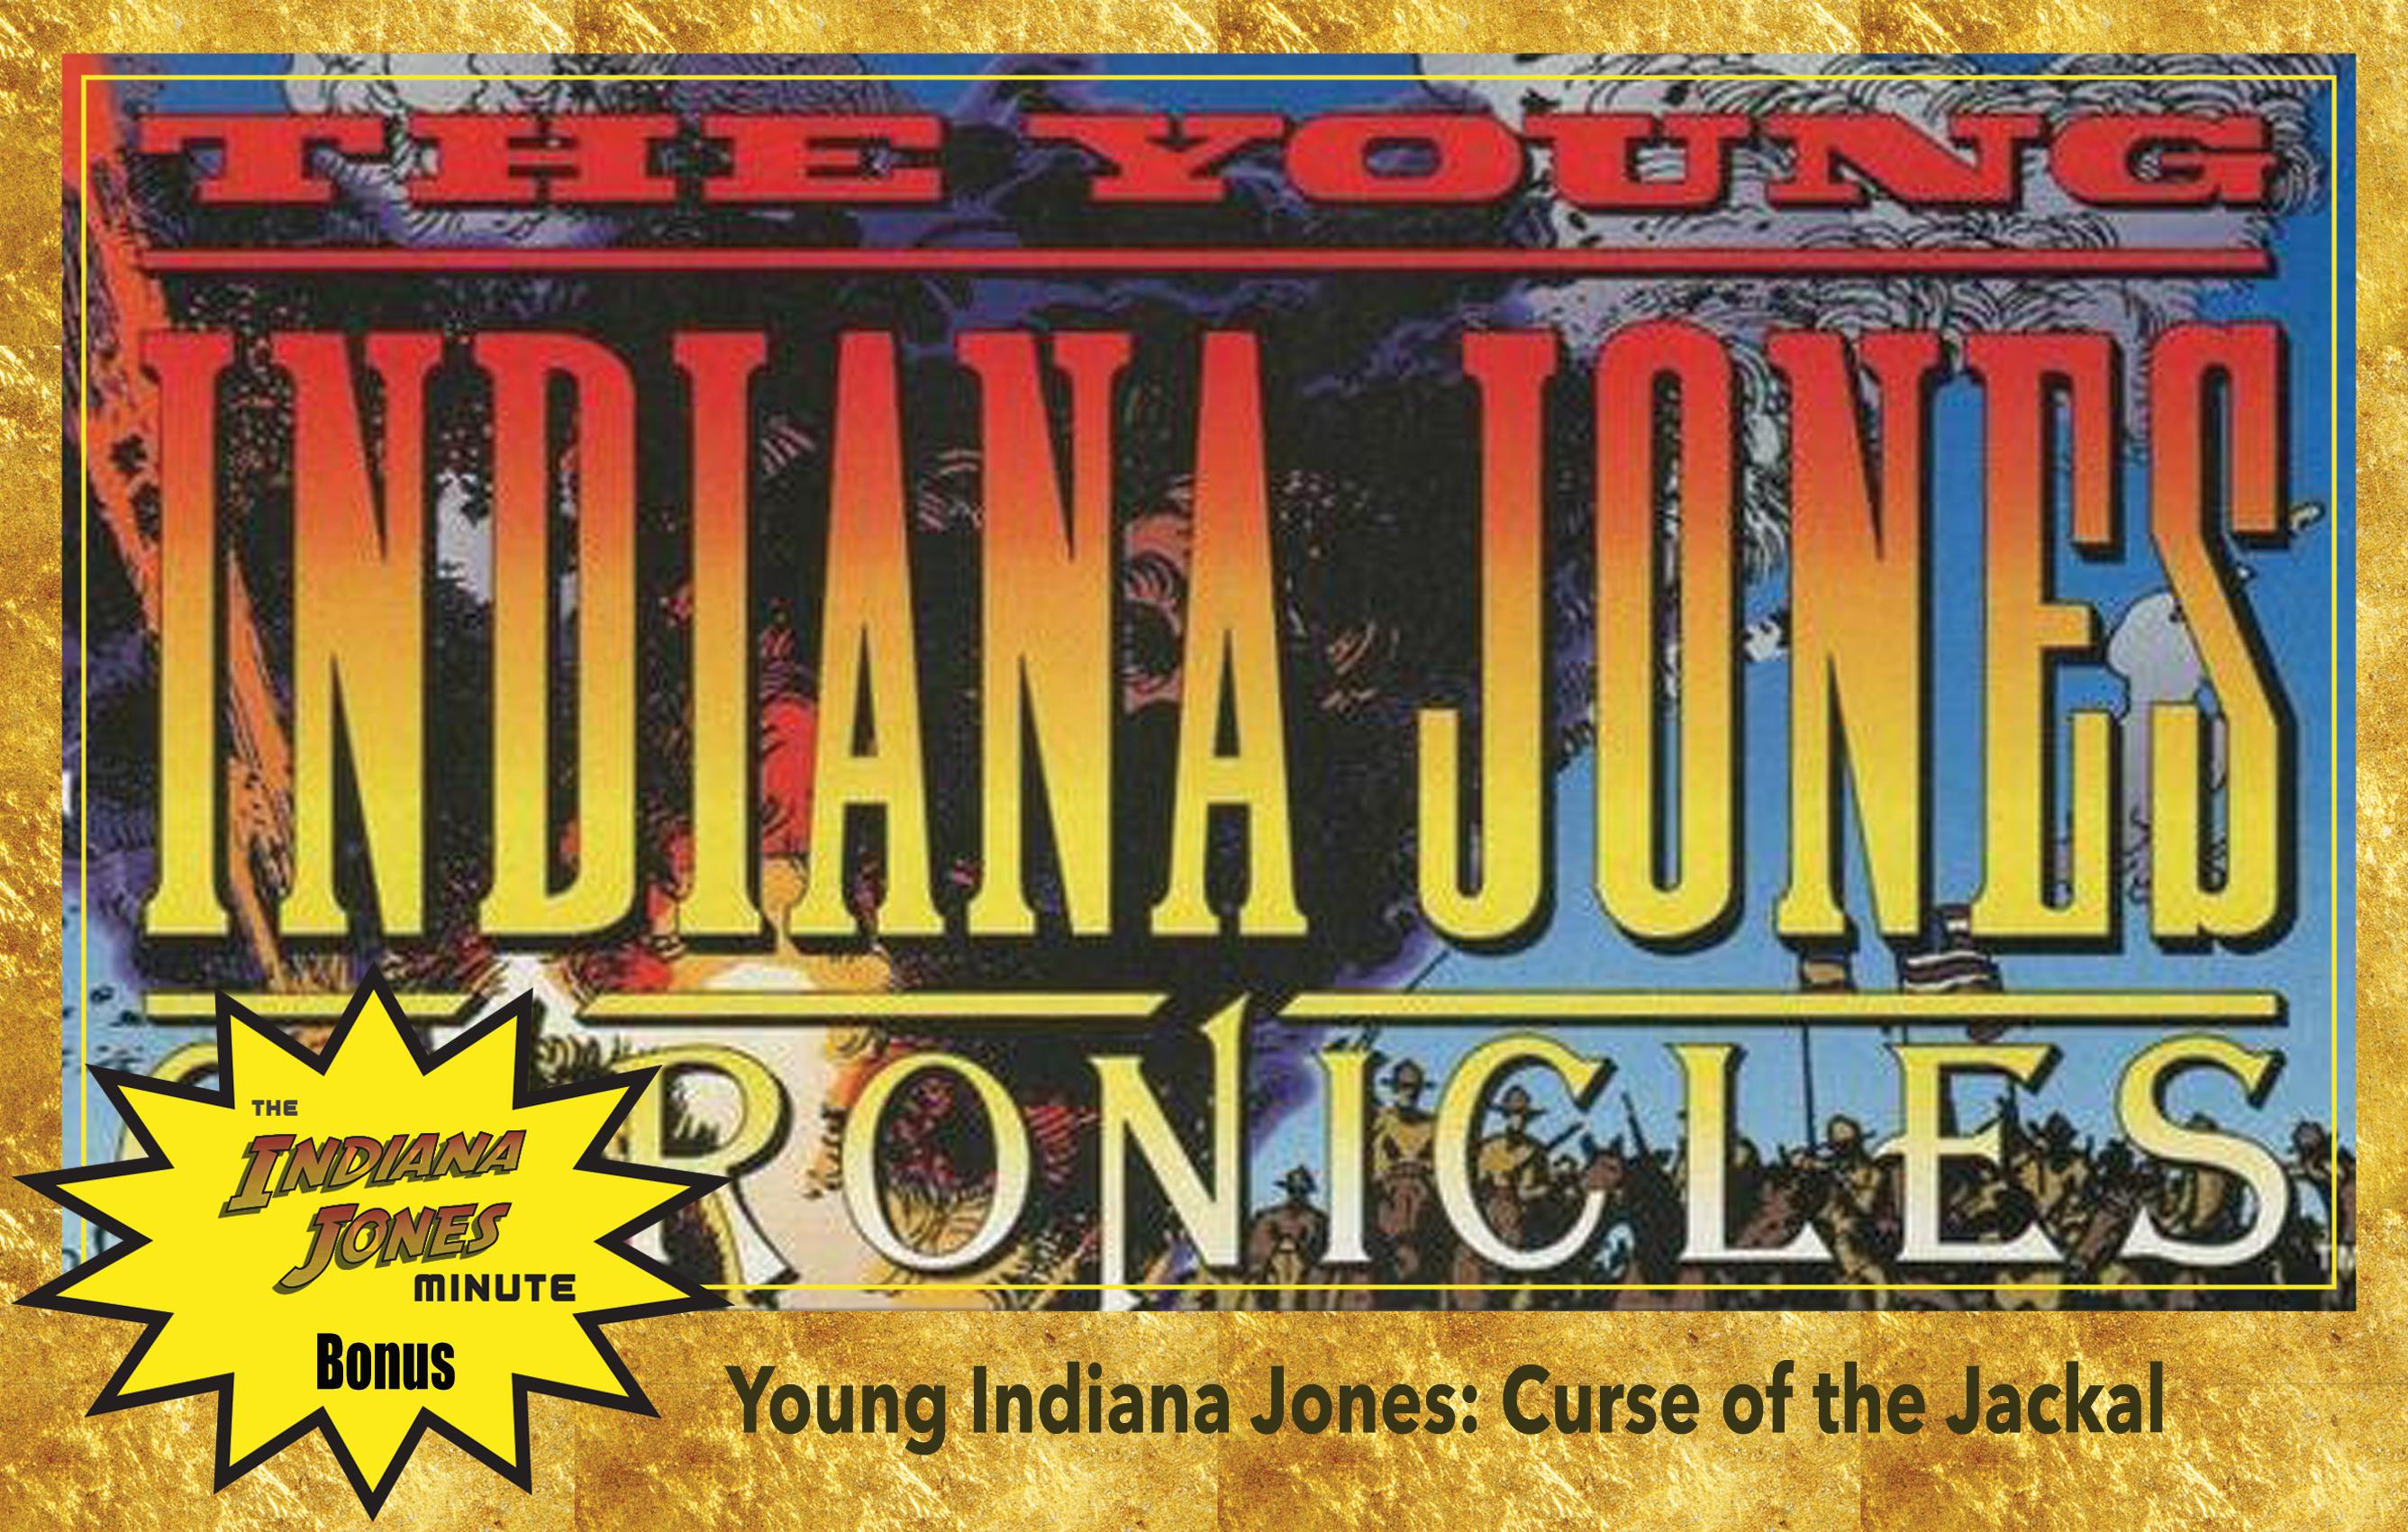 Bonus: Young Indiana Jones Chronicles: Curse of the Jackal